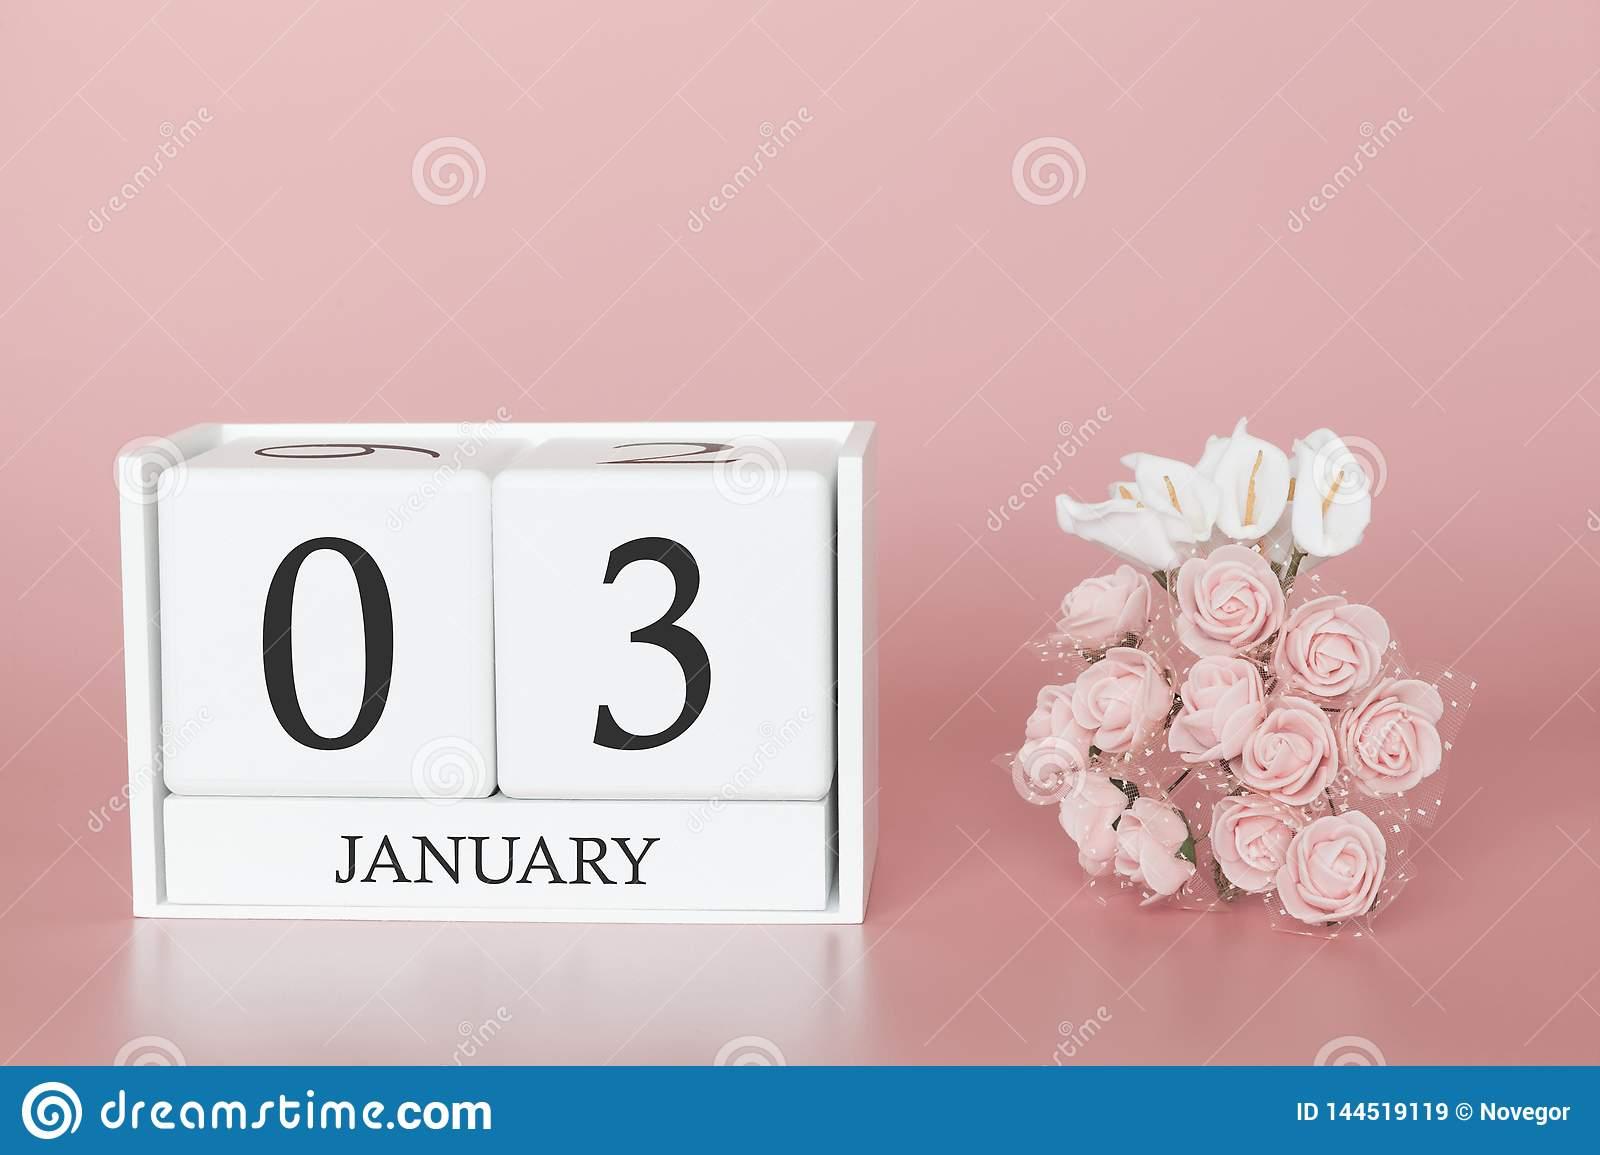 January 03Rd. Day 3 Of Month. Calendar Cube On Modern Pink inside 3 Month Calendar Holder